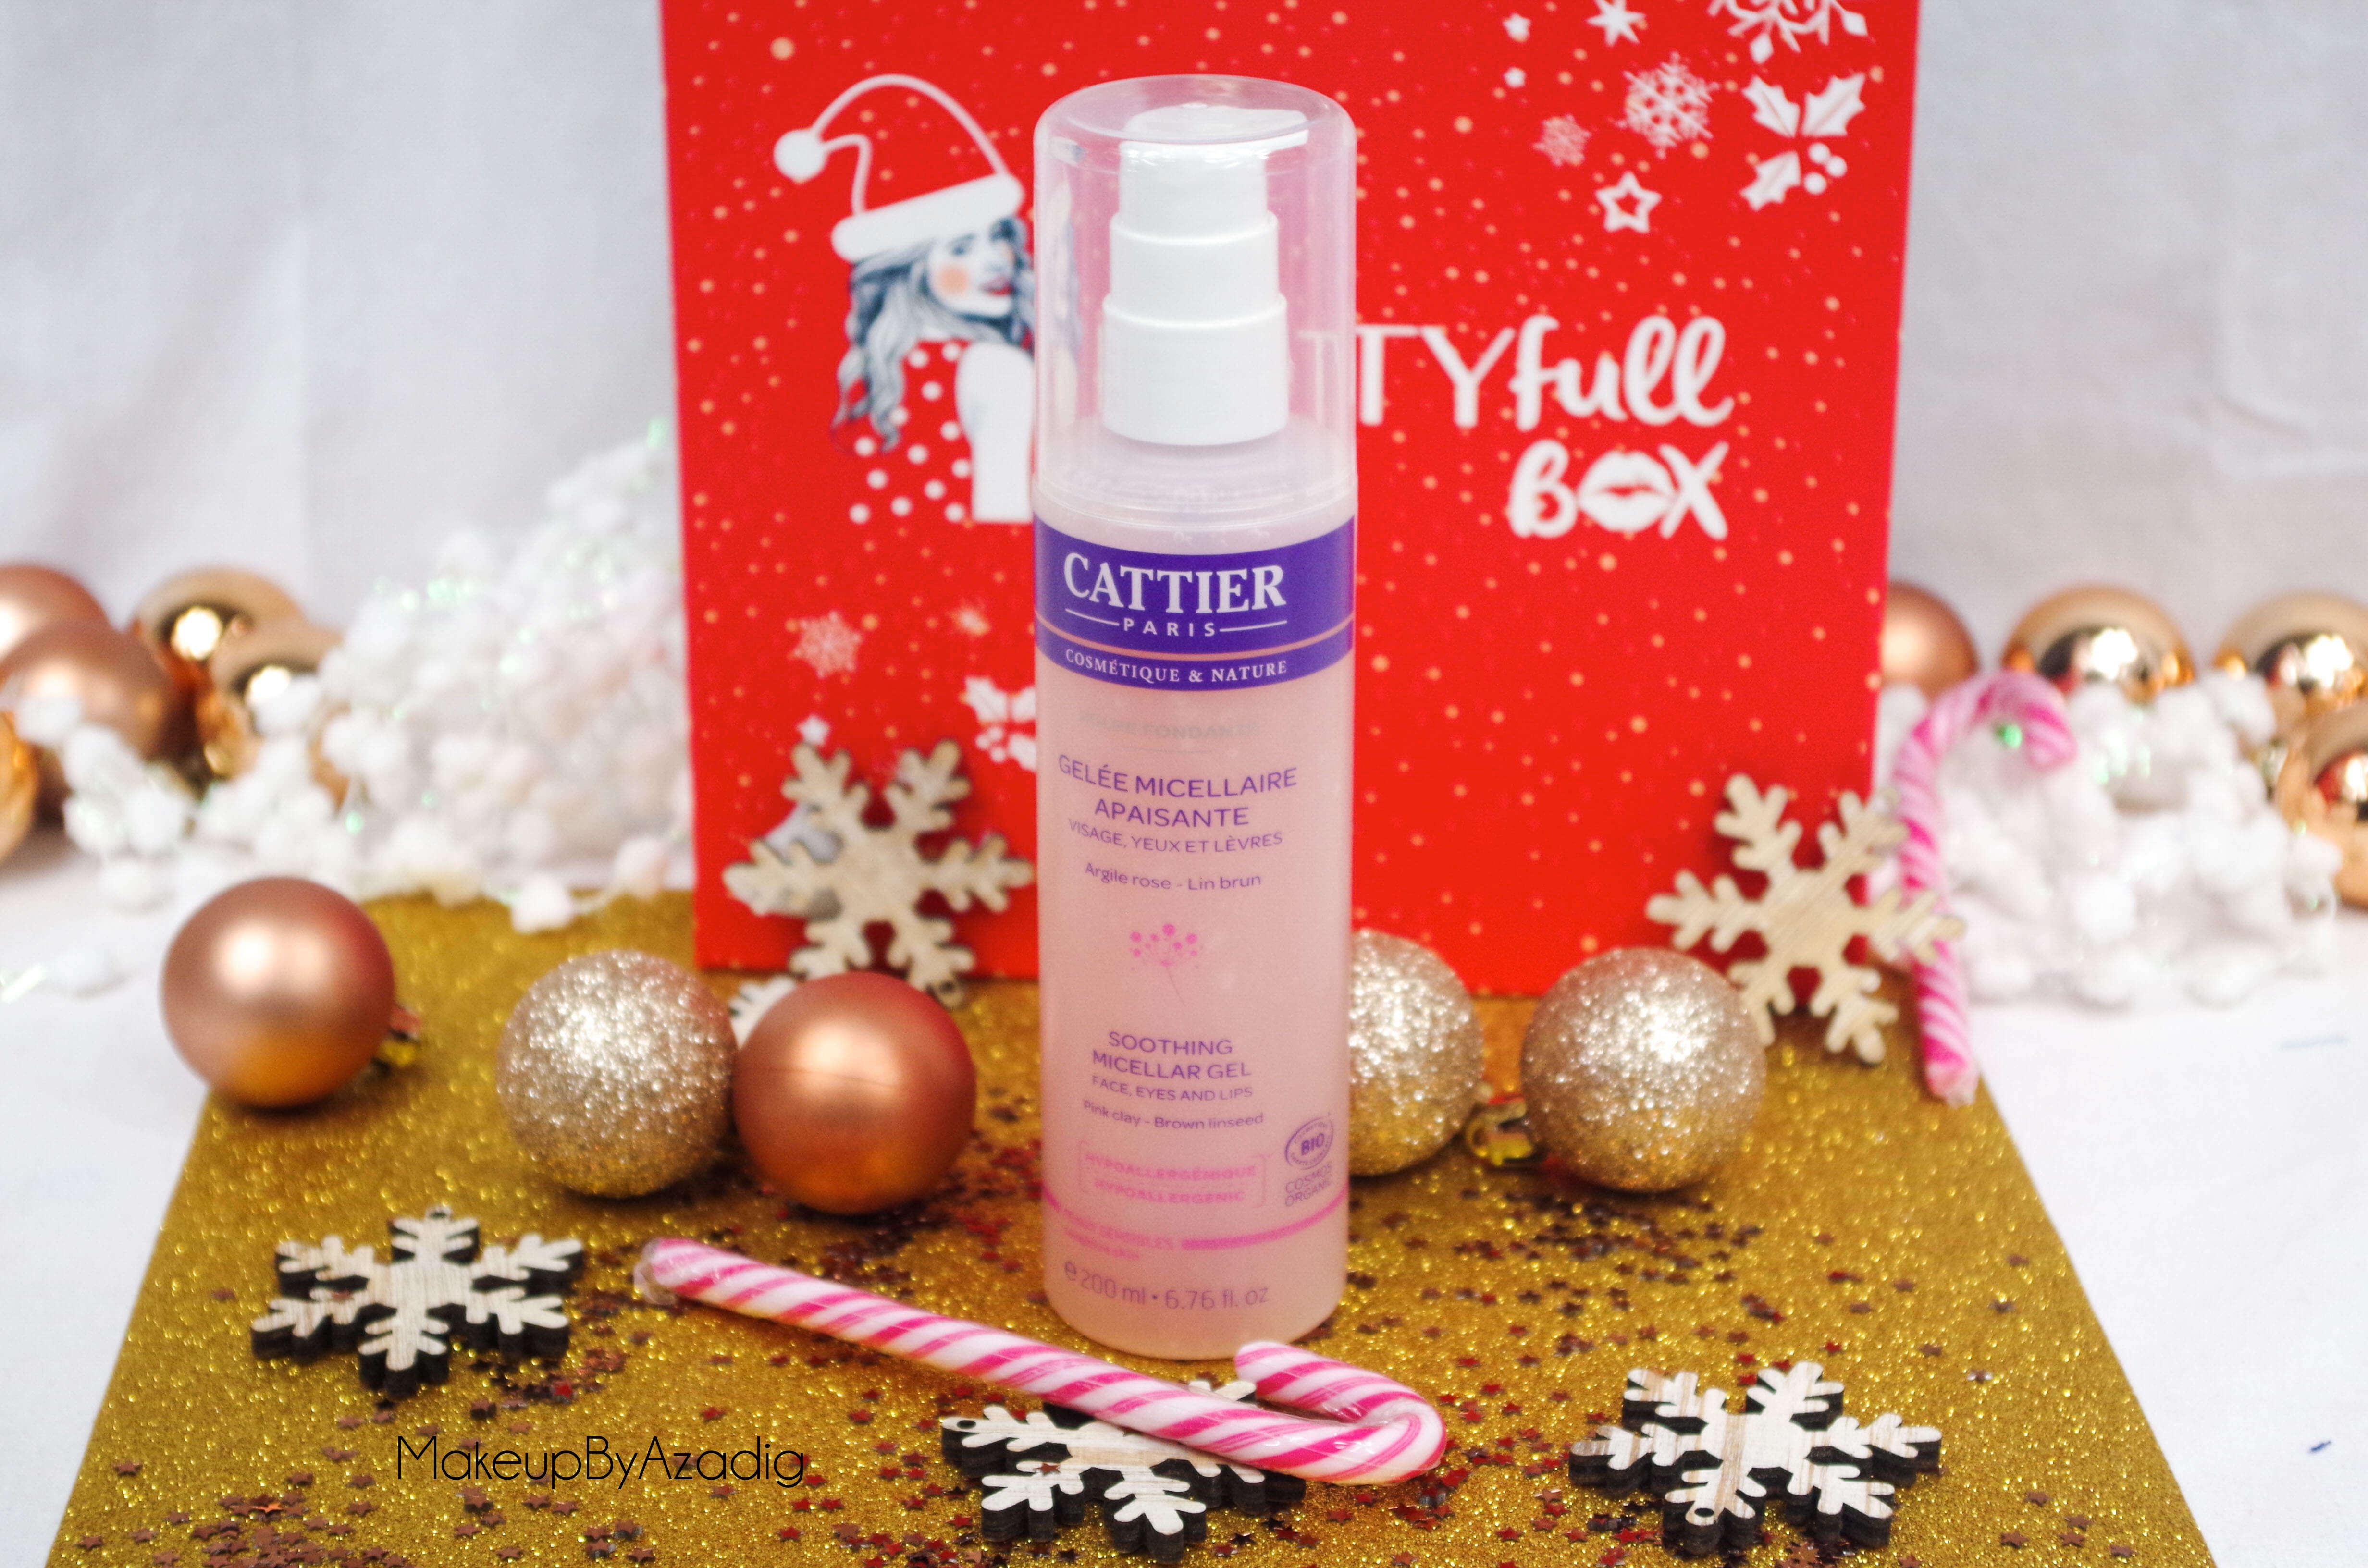 biotyfull-box-beaute-makeupbyazadig-revue-avis-prix-troyes-paris-produits-bio-gelee-micellaire